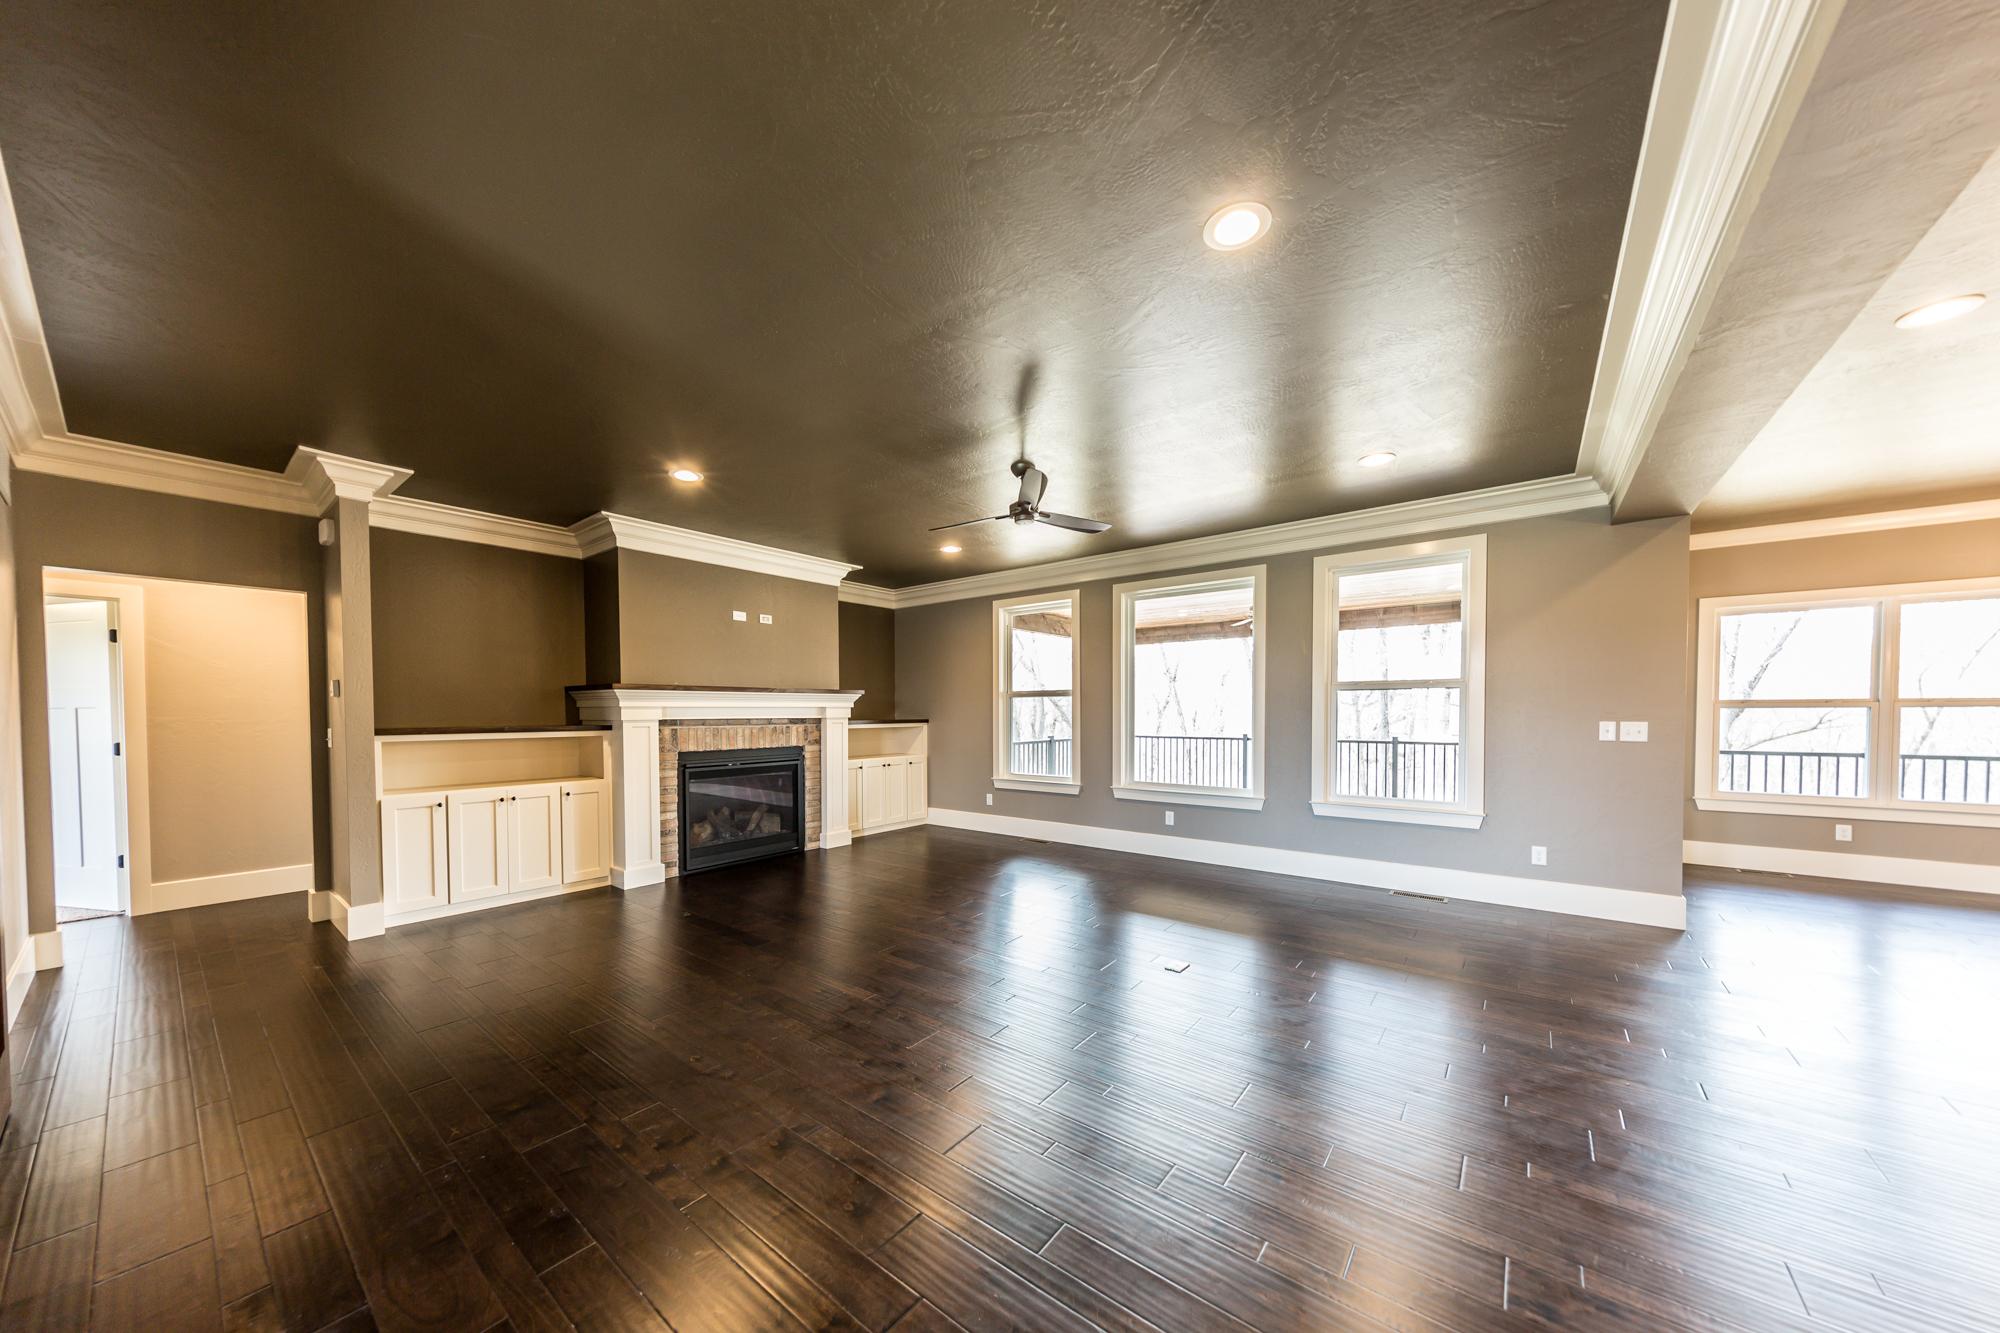 New-Construction-For-Sale-Bethel-Ridge-Farms-Scott-AFB-Illinois-3.jpg